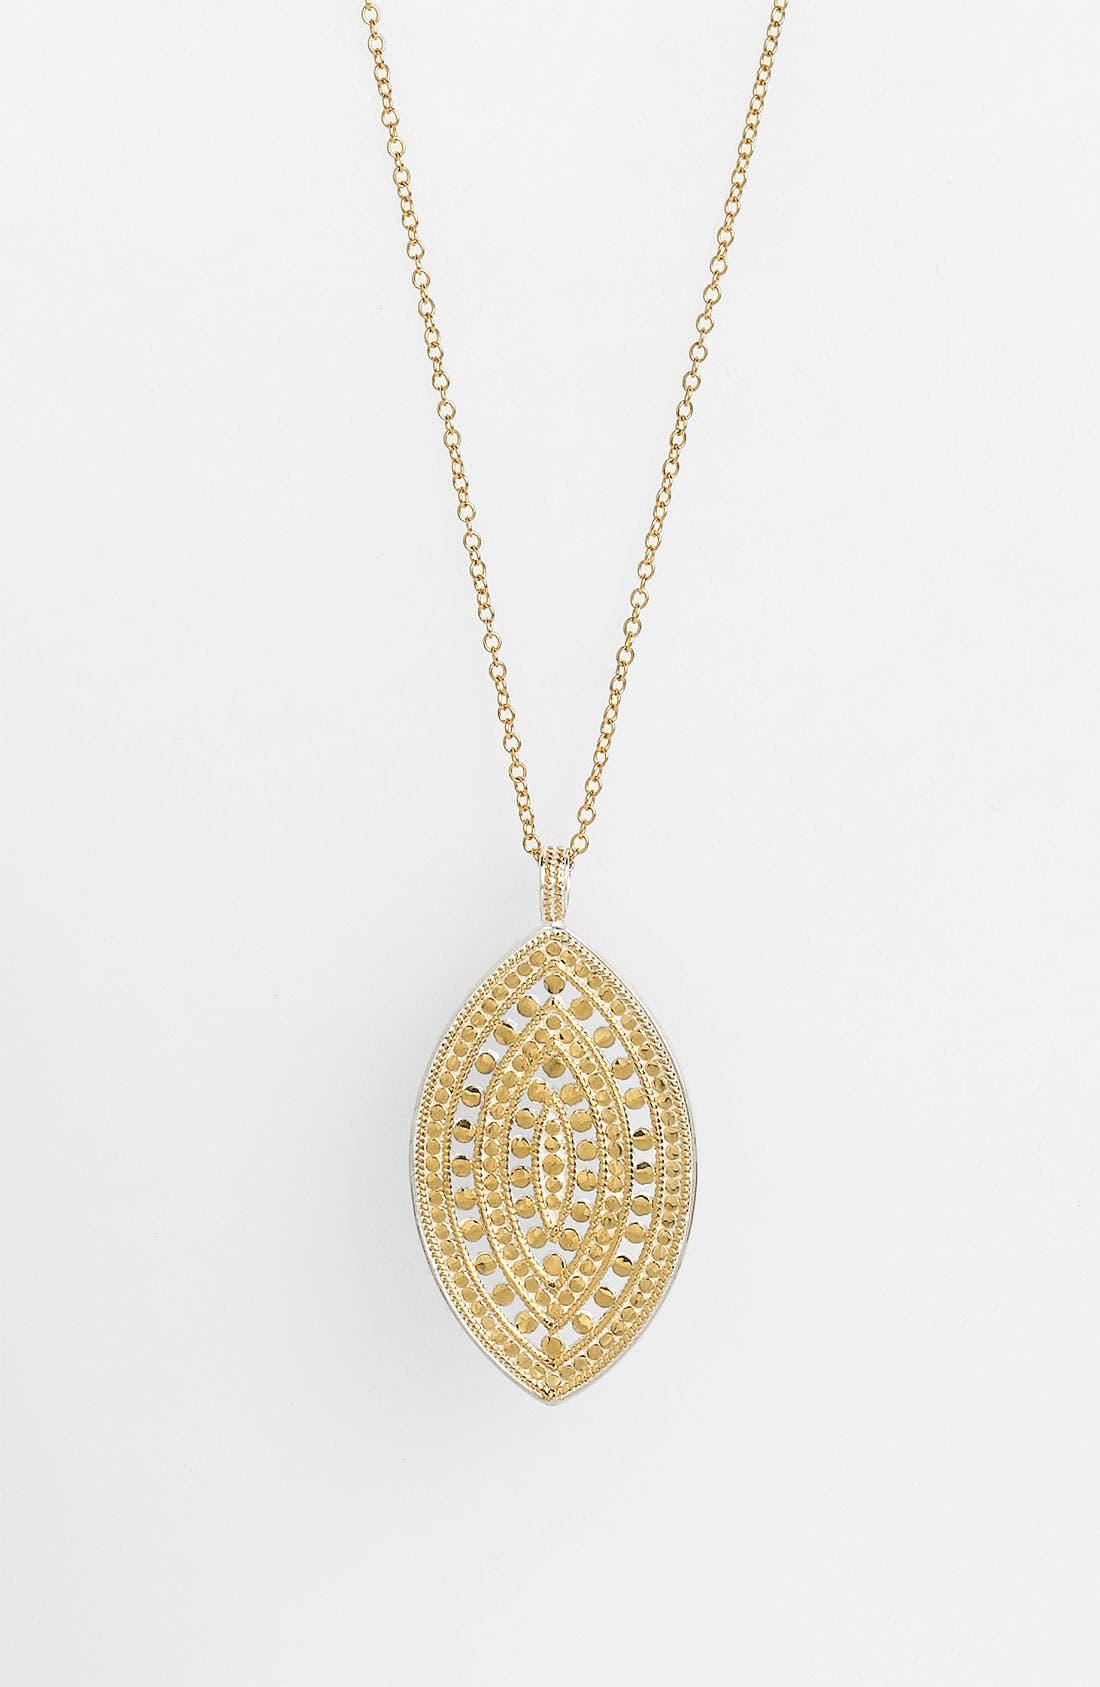 Alternate Image 1 Selected - Anna Beck 'Lombok' Long Leaf Pendant Necklace